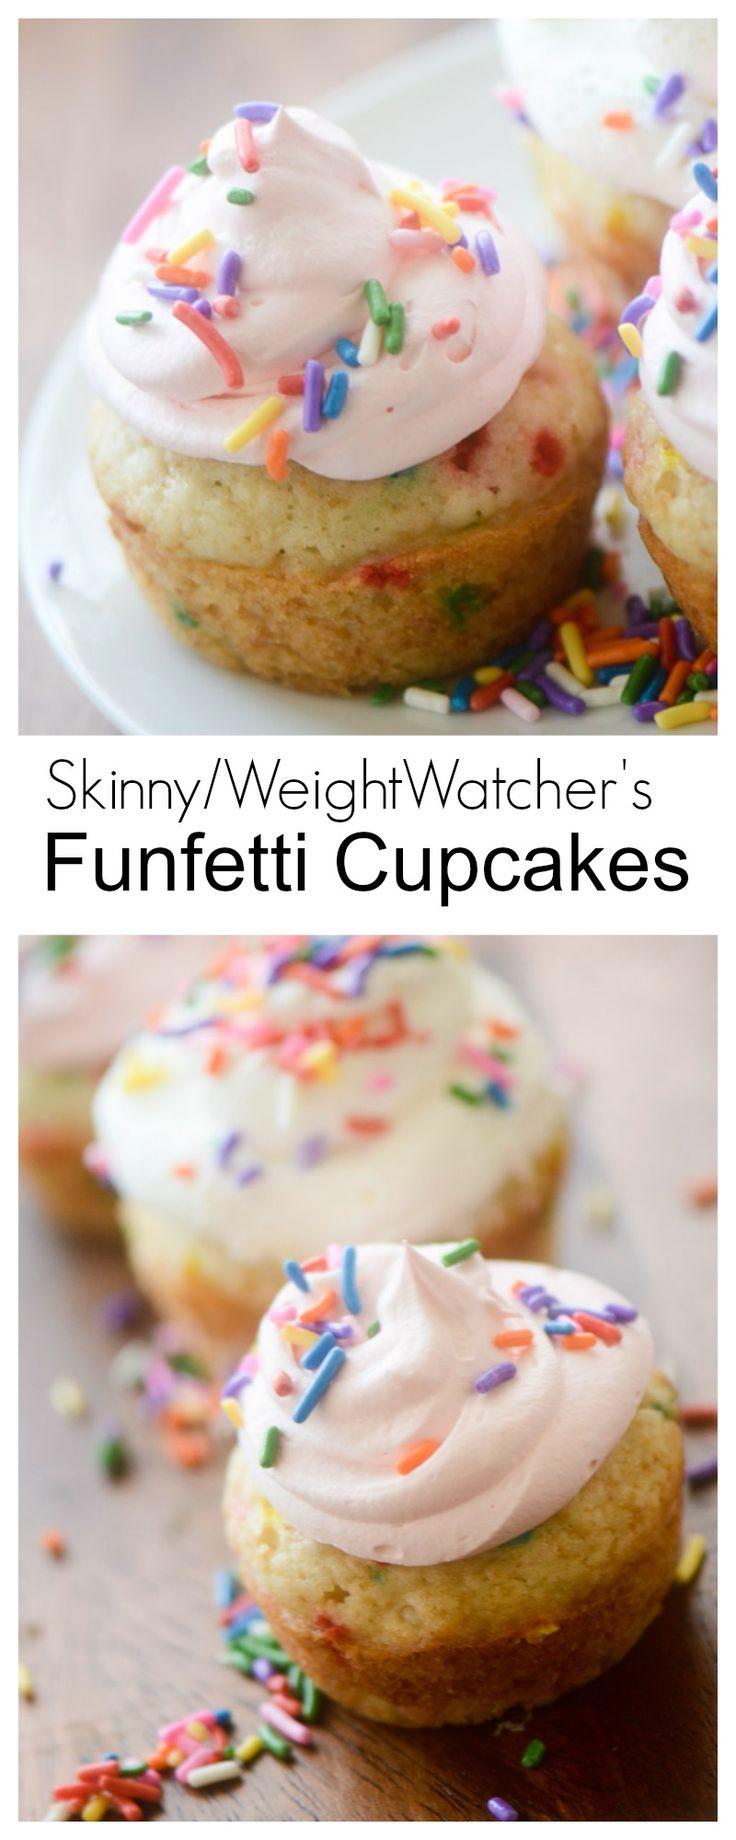 Skinny / Weight Watcher's Funfetti Cupcakes